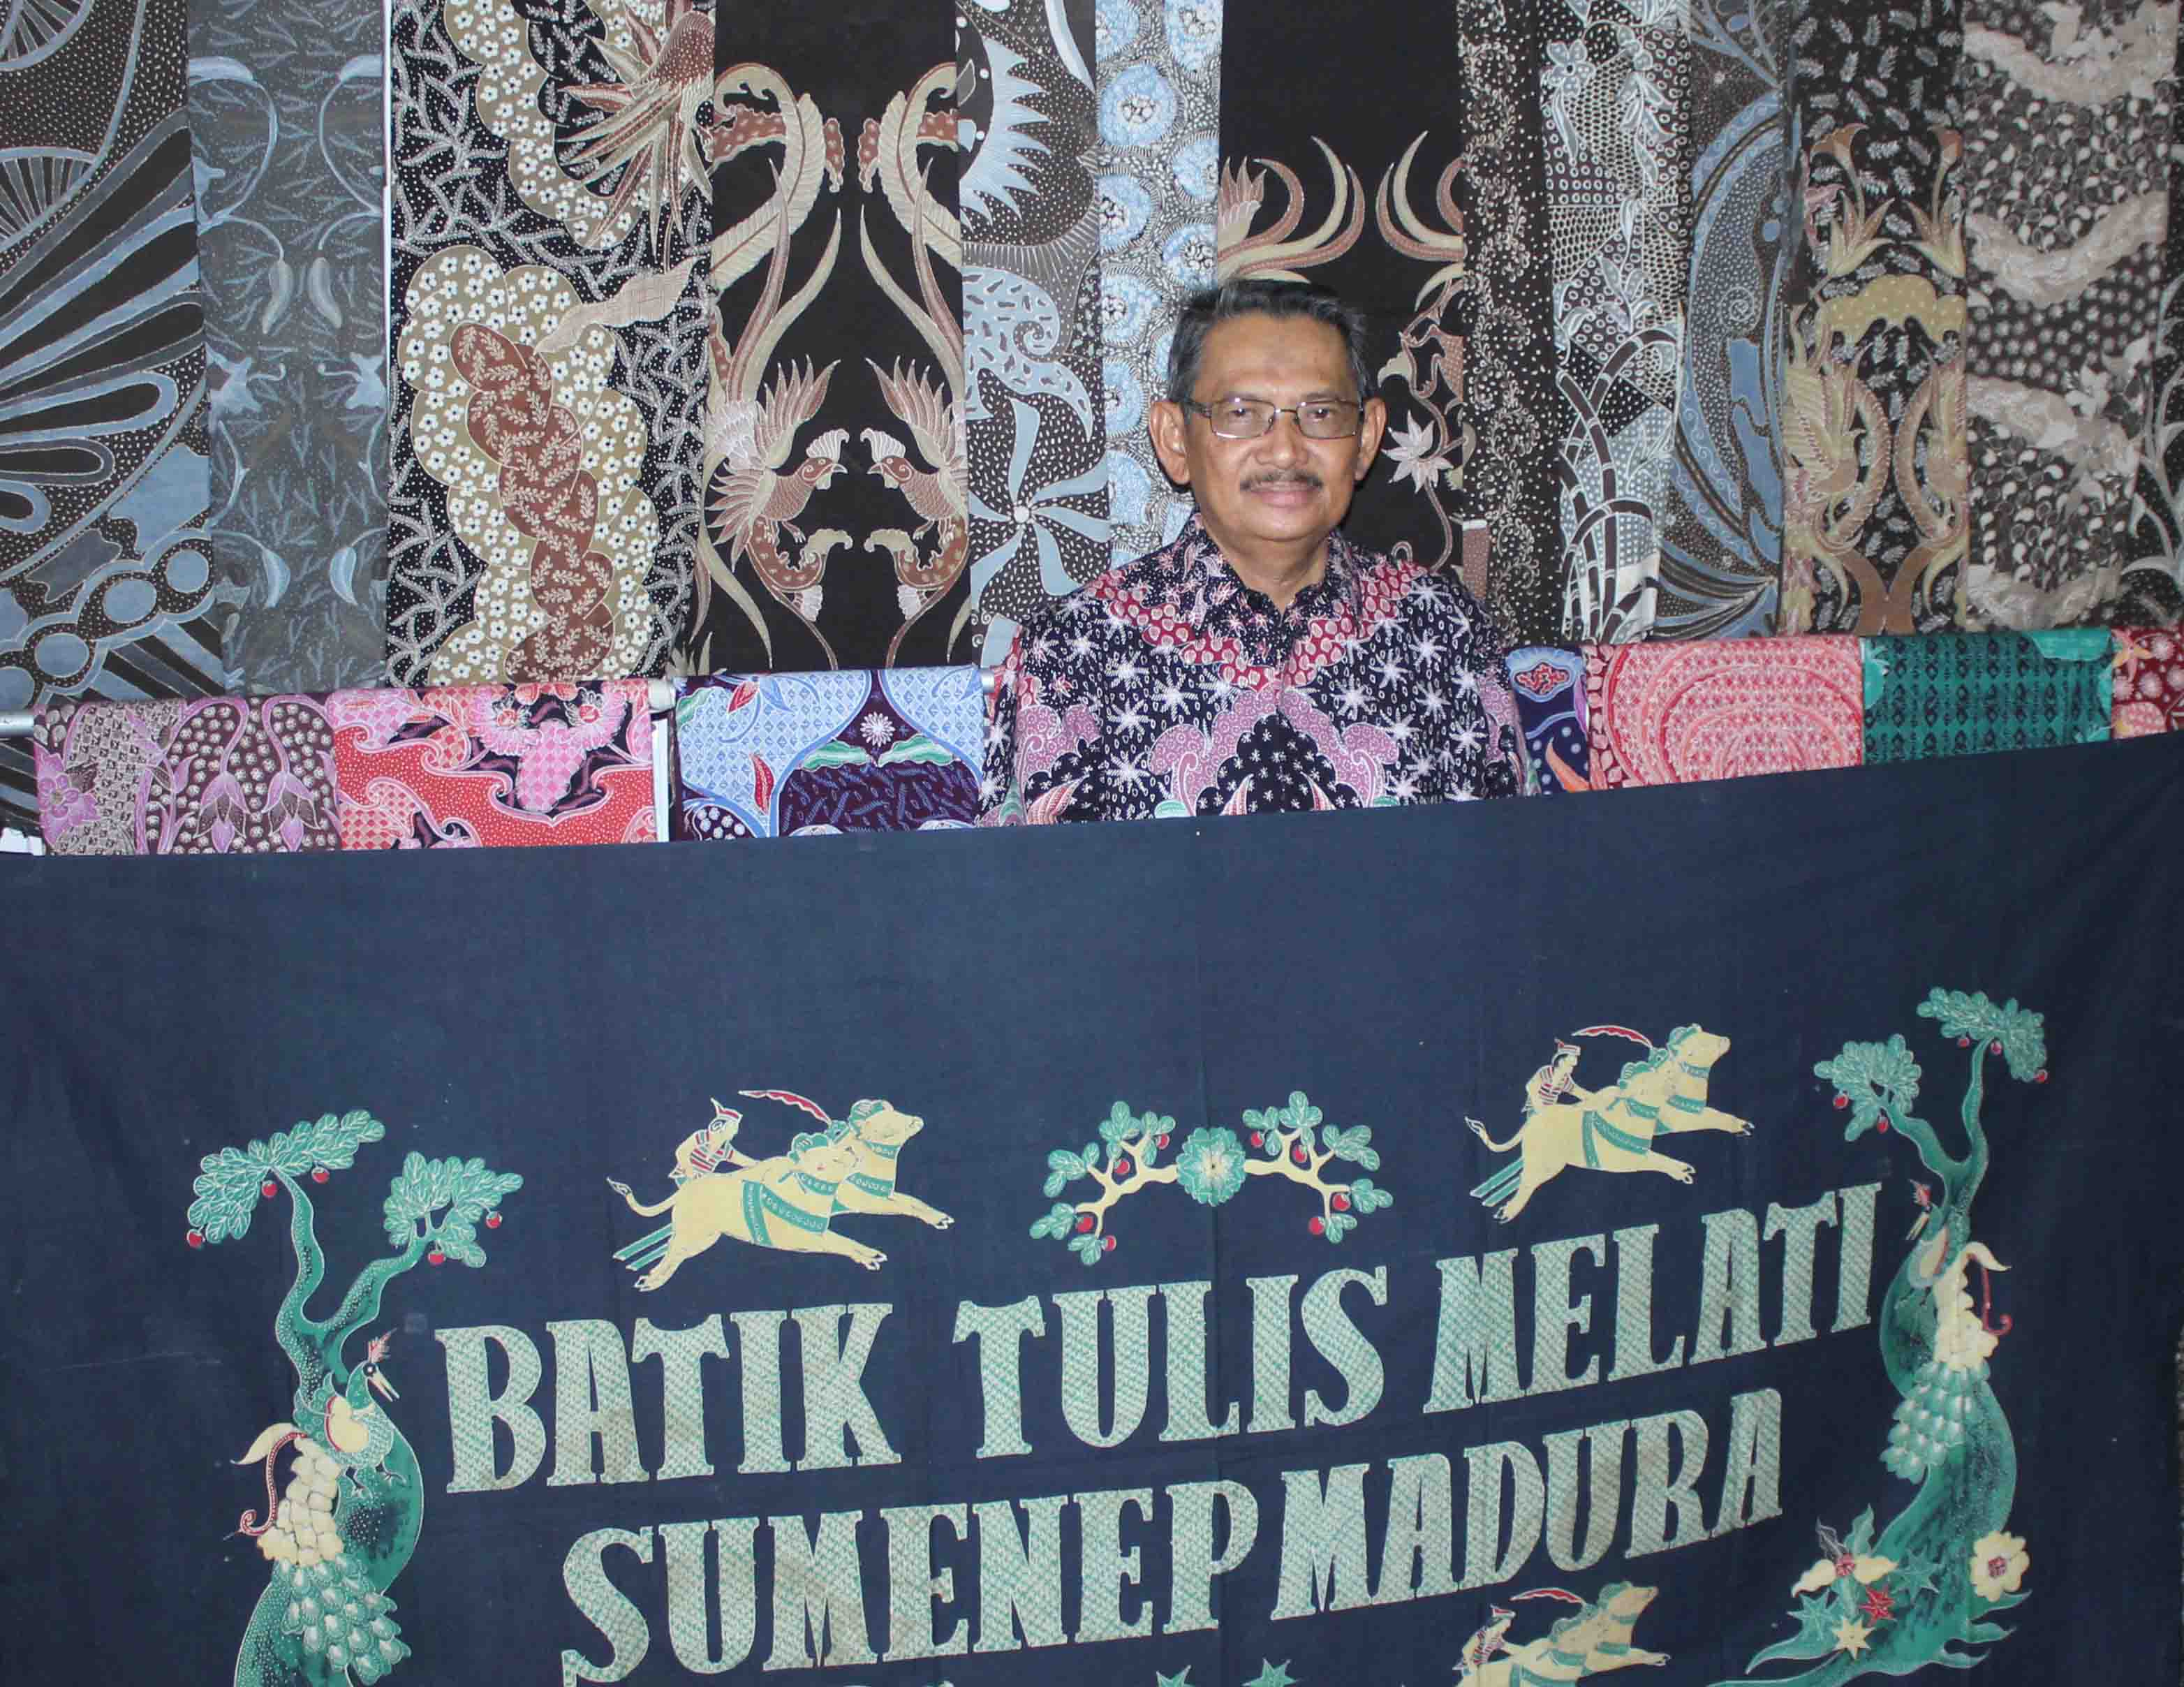 Mengenal Umkm Binaan Bprs Bhakti Sumekar Strategi Penguatan Ekonomi Kecil